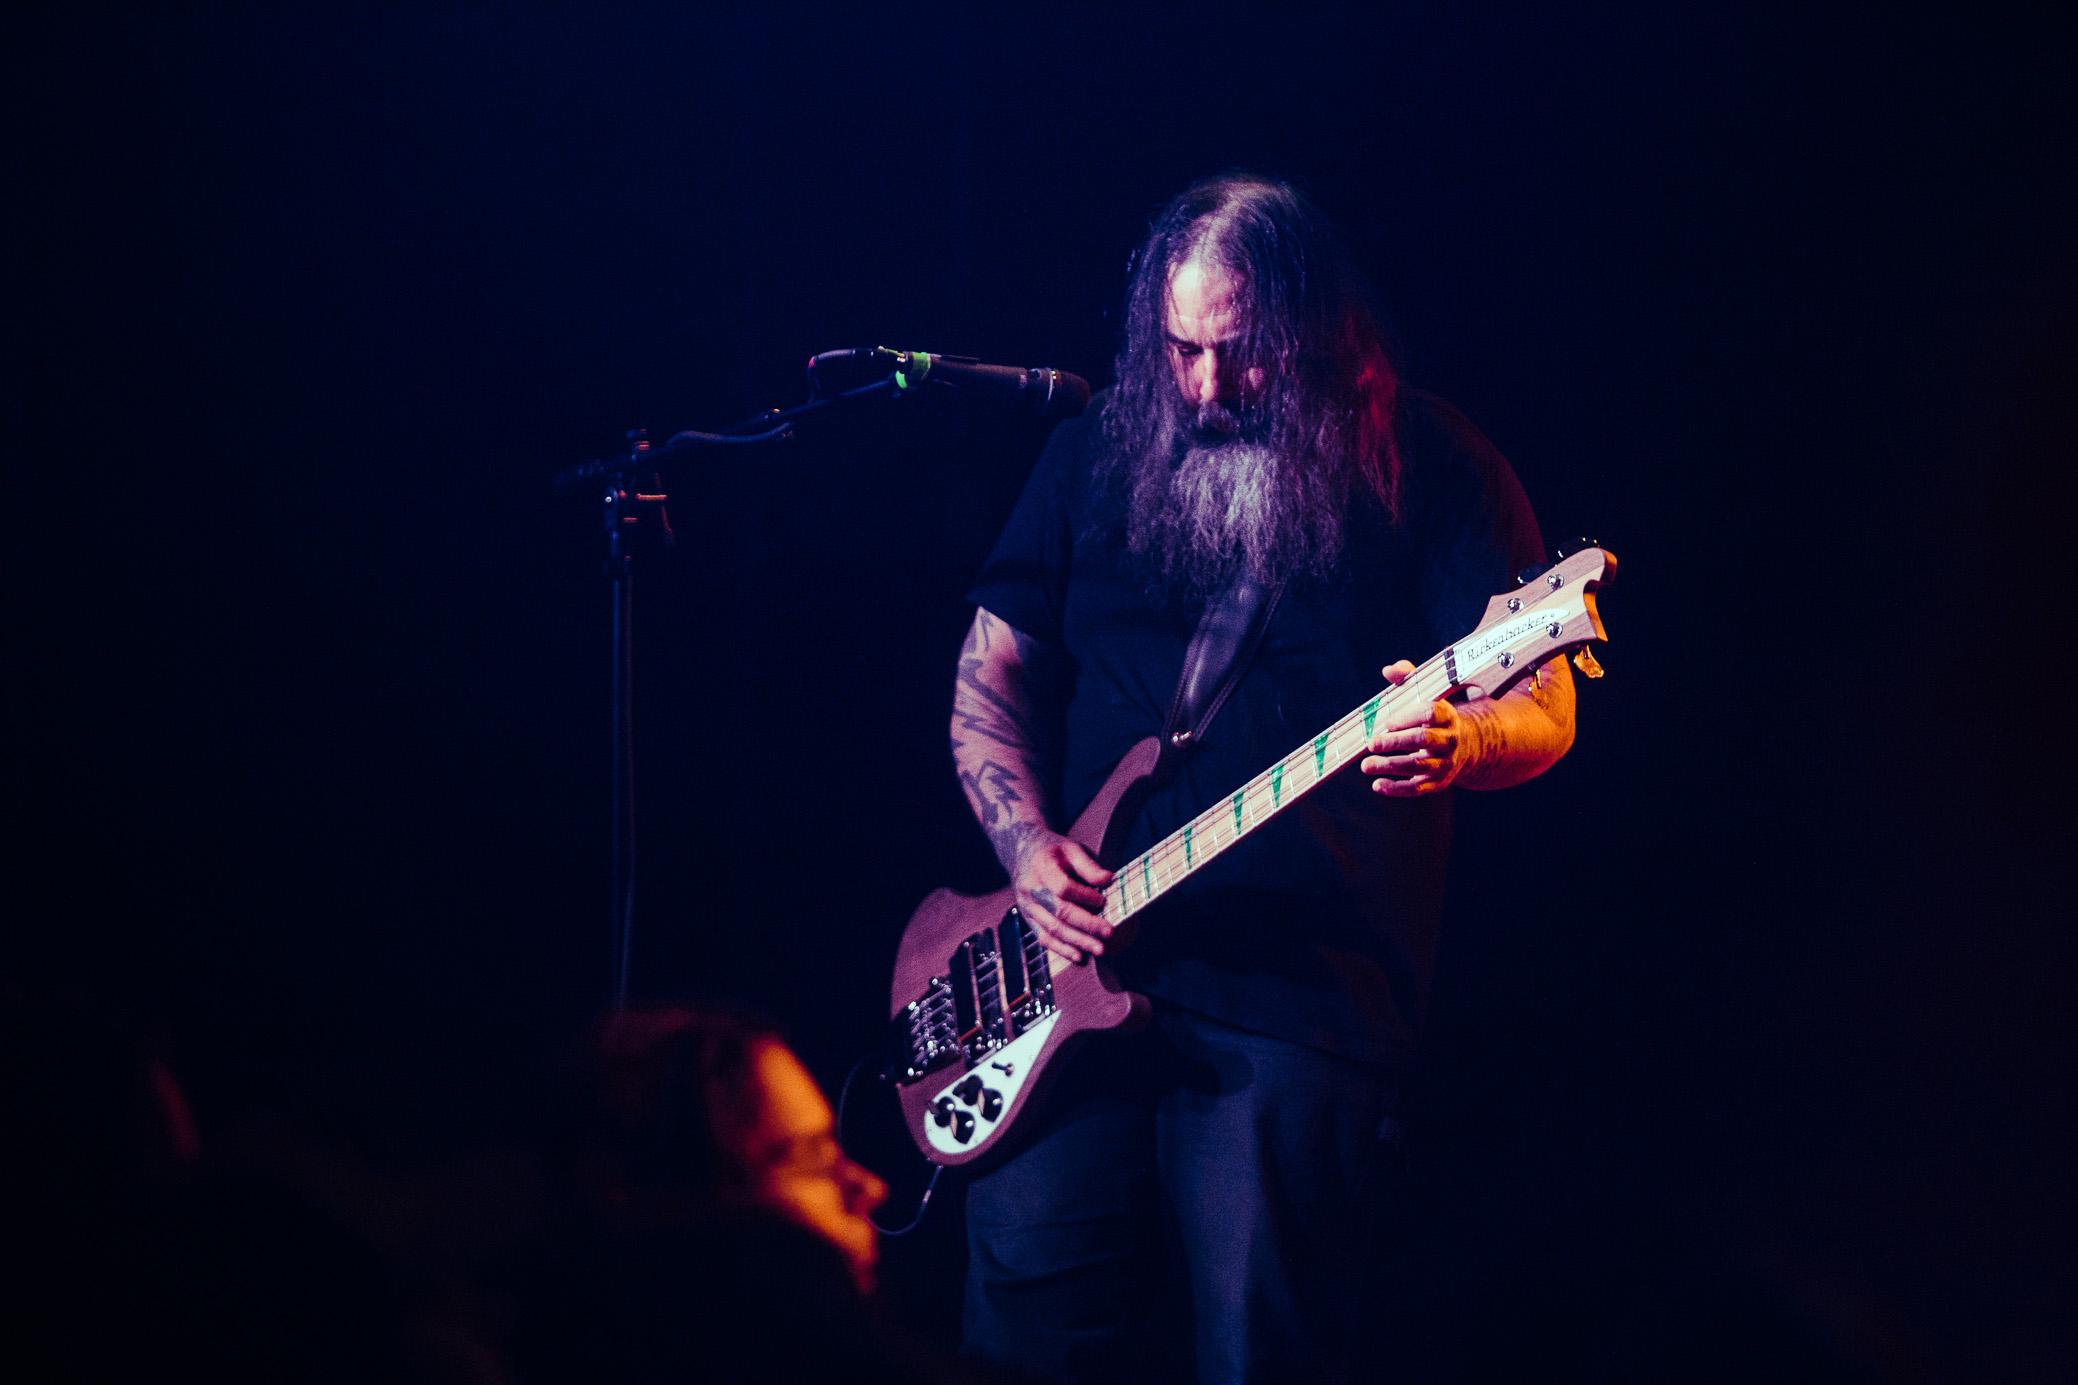 Sleep performs in concert at Saturn Birmingham in Birmingham, Alabama on June 14th, 2019. (Photo by David A. Smith / DSmithScenes)